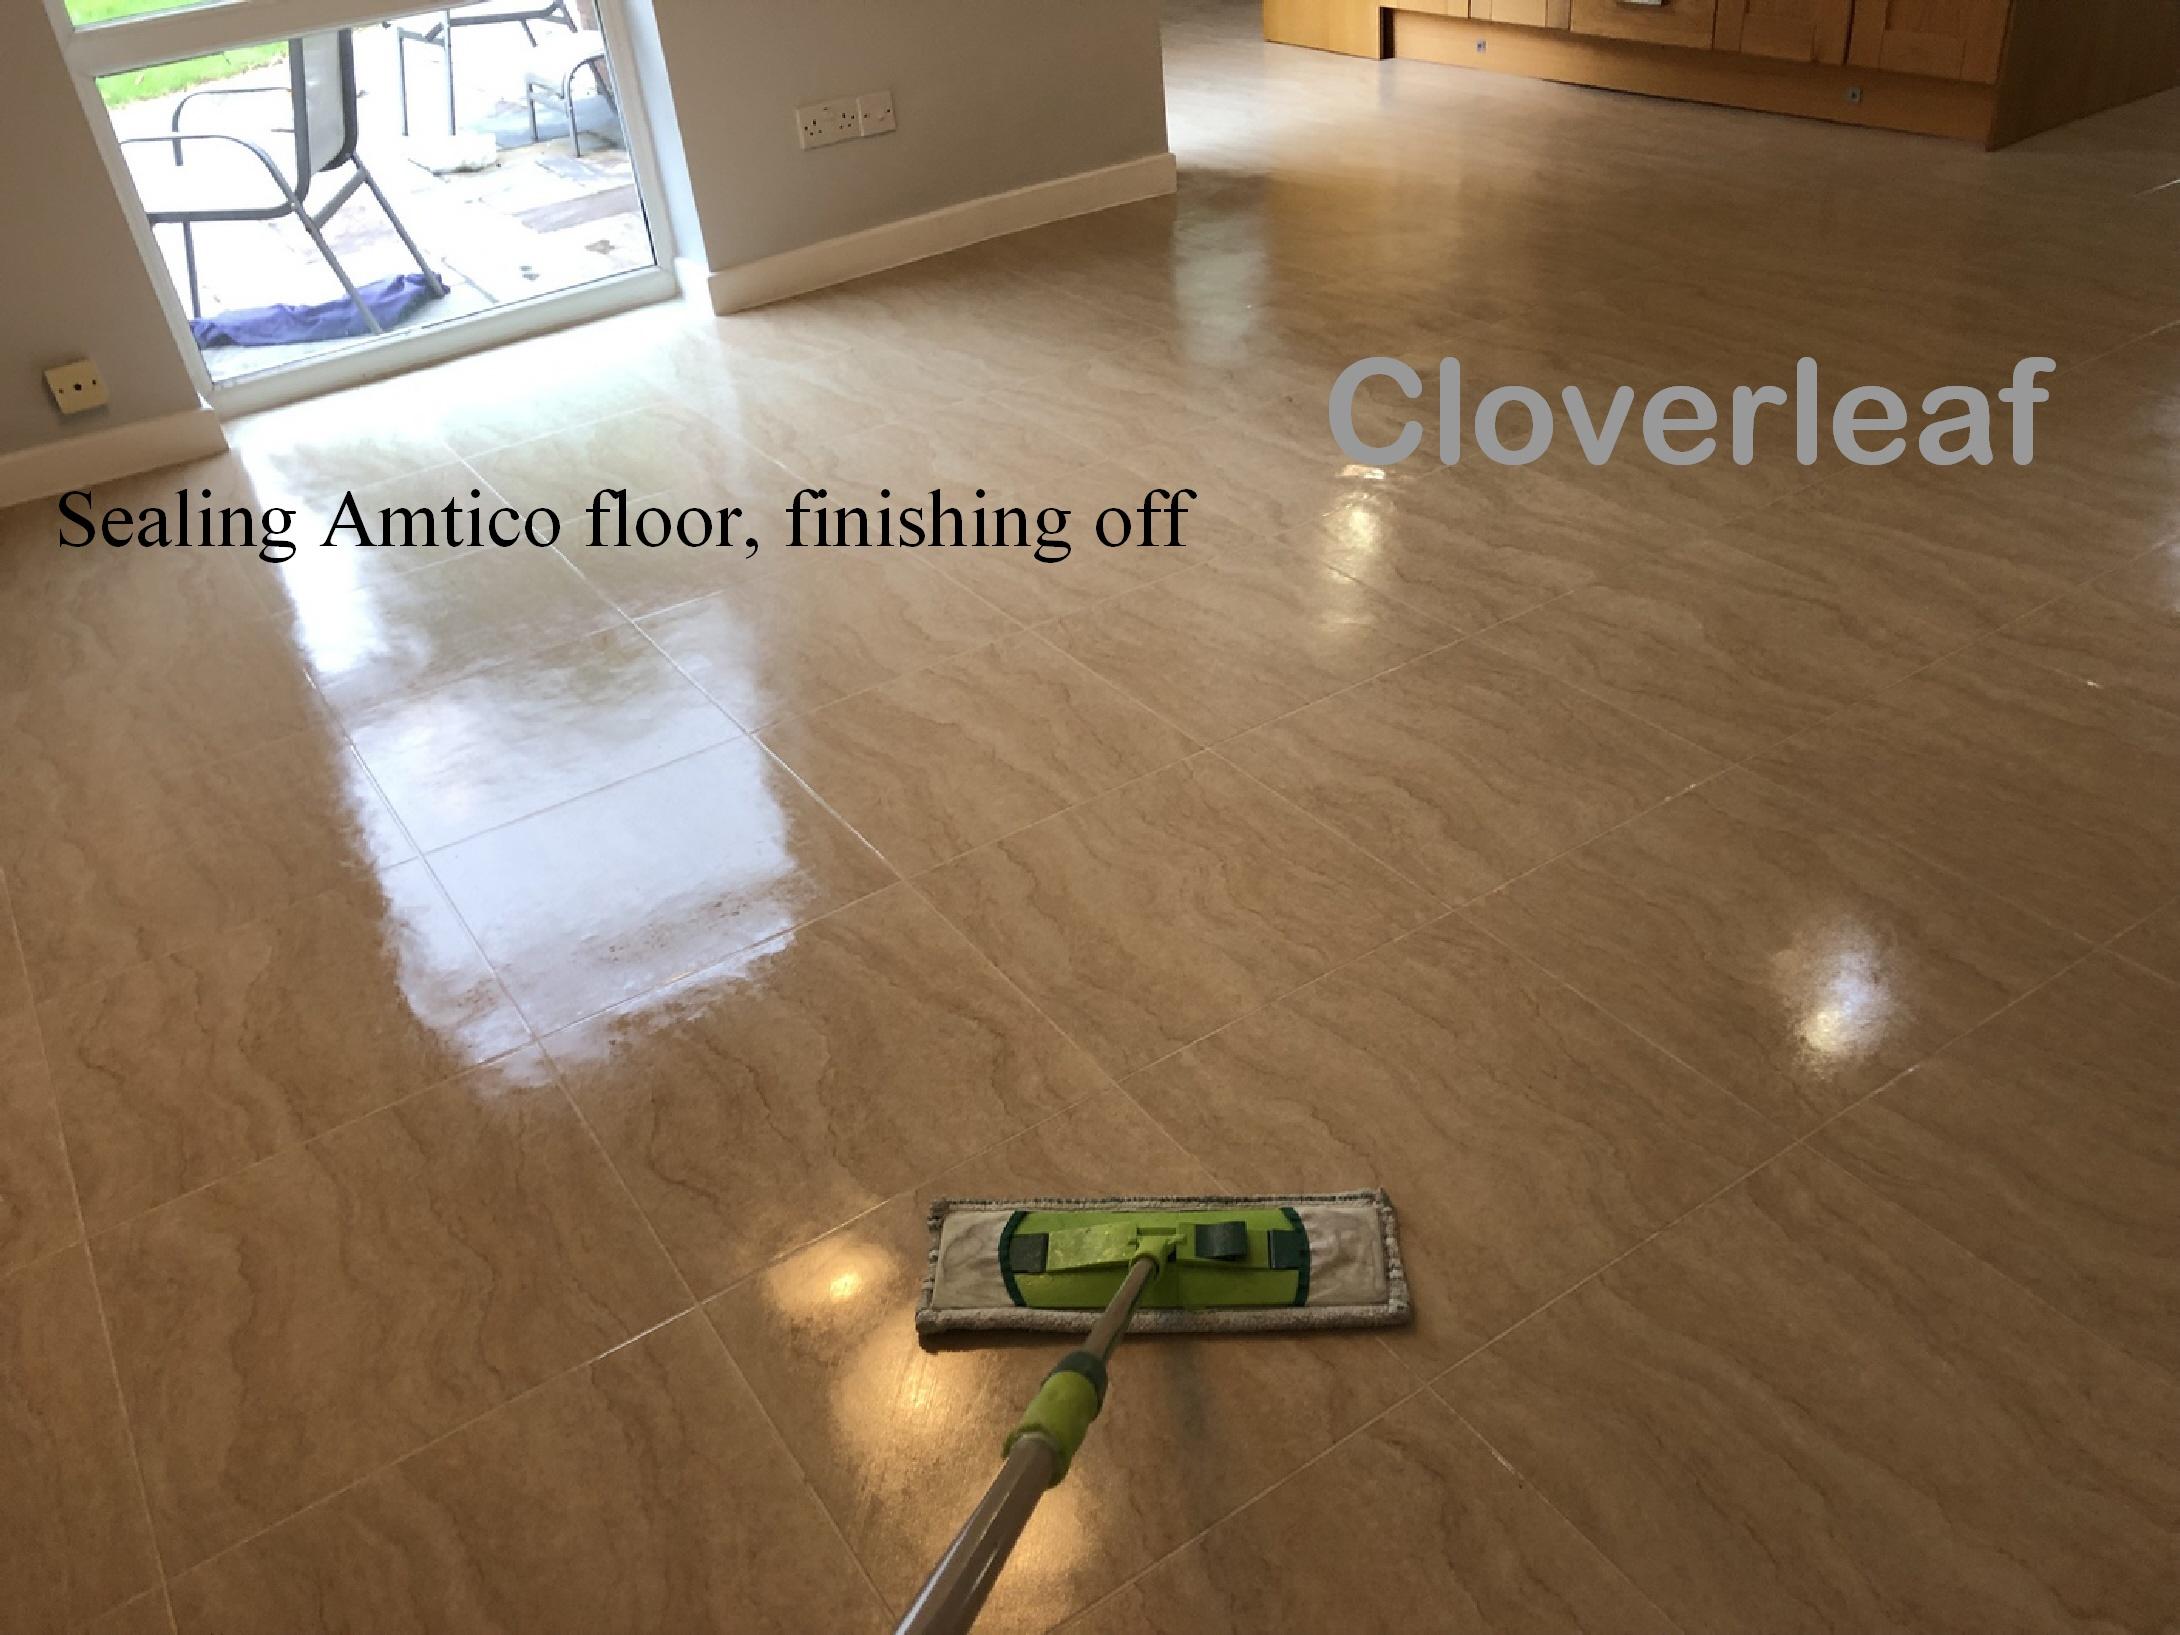 satin finish floor seal for Amtico